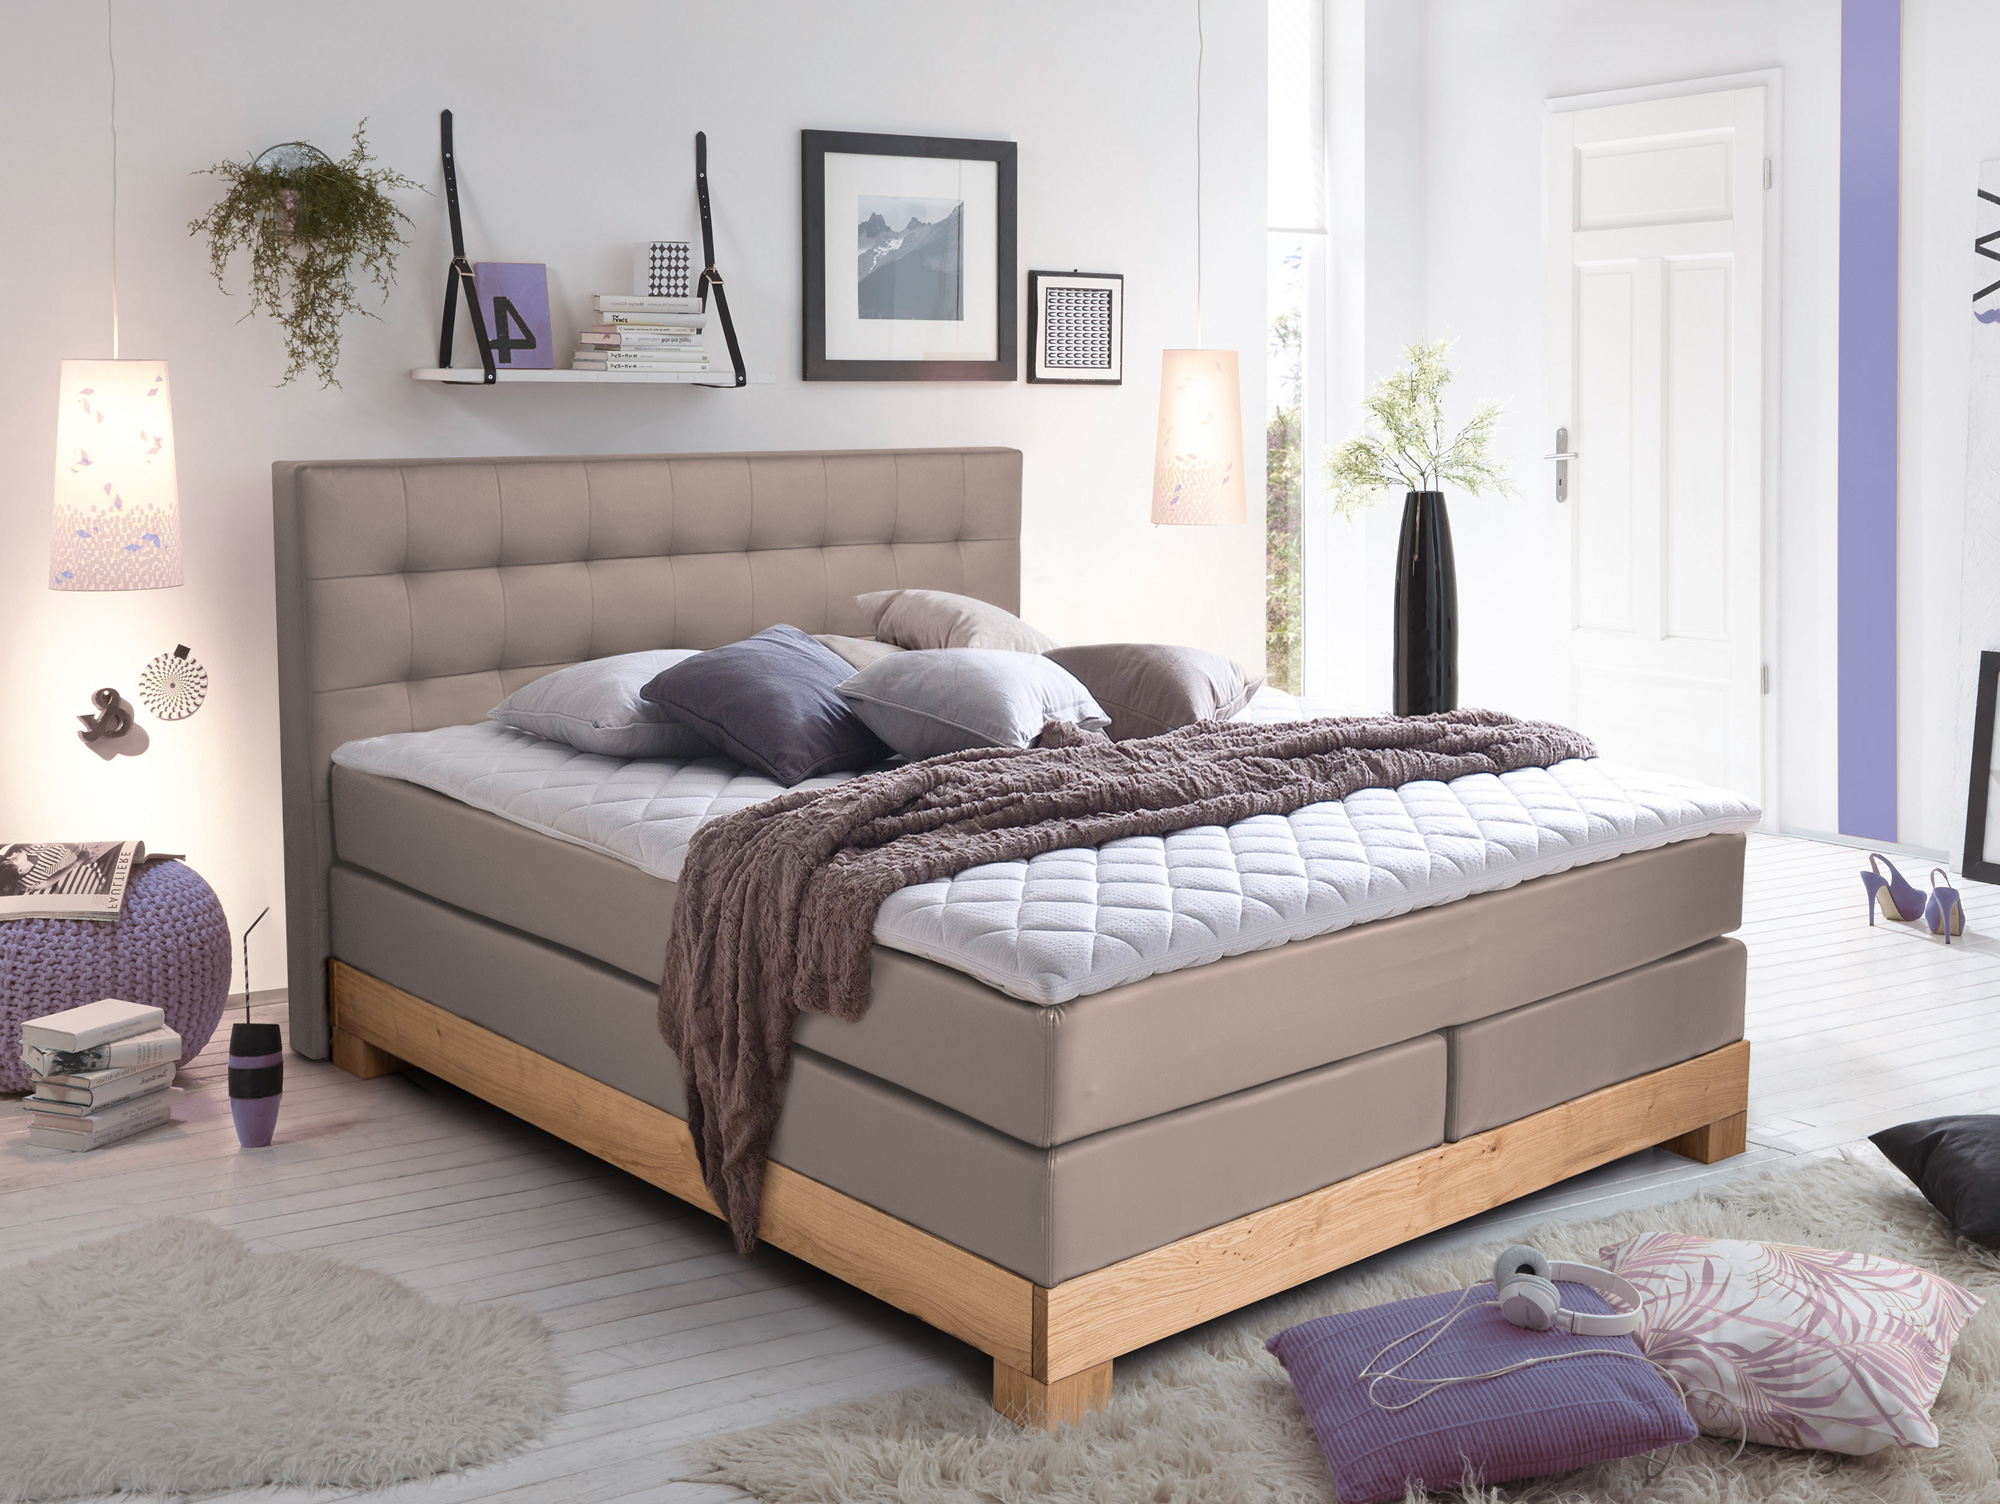 arche boxspringbett mit massivholzrahmen 160 x 200 cm muddy buche h rtegrad 2. Black Bedroom Furniture Sets. Home Design Ideas